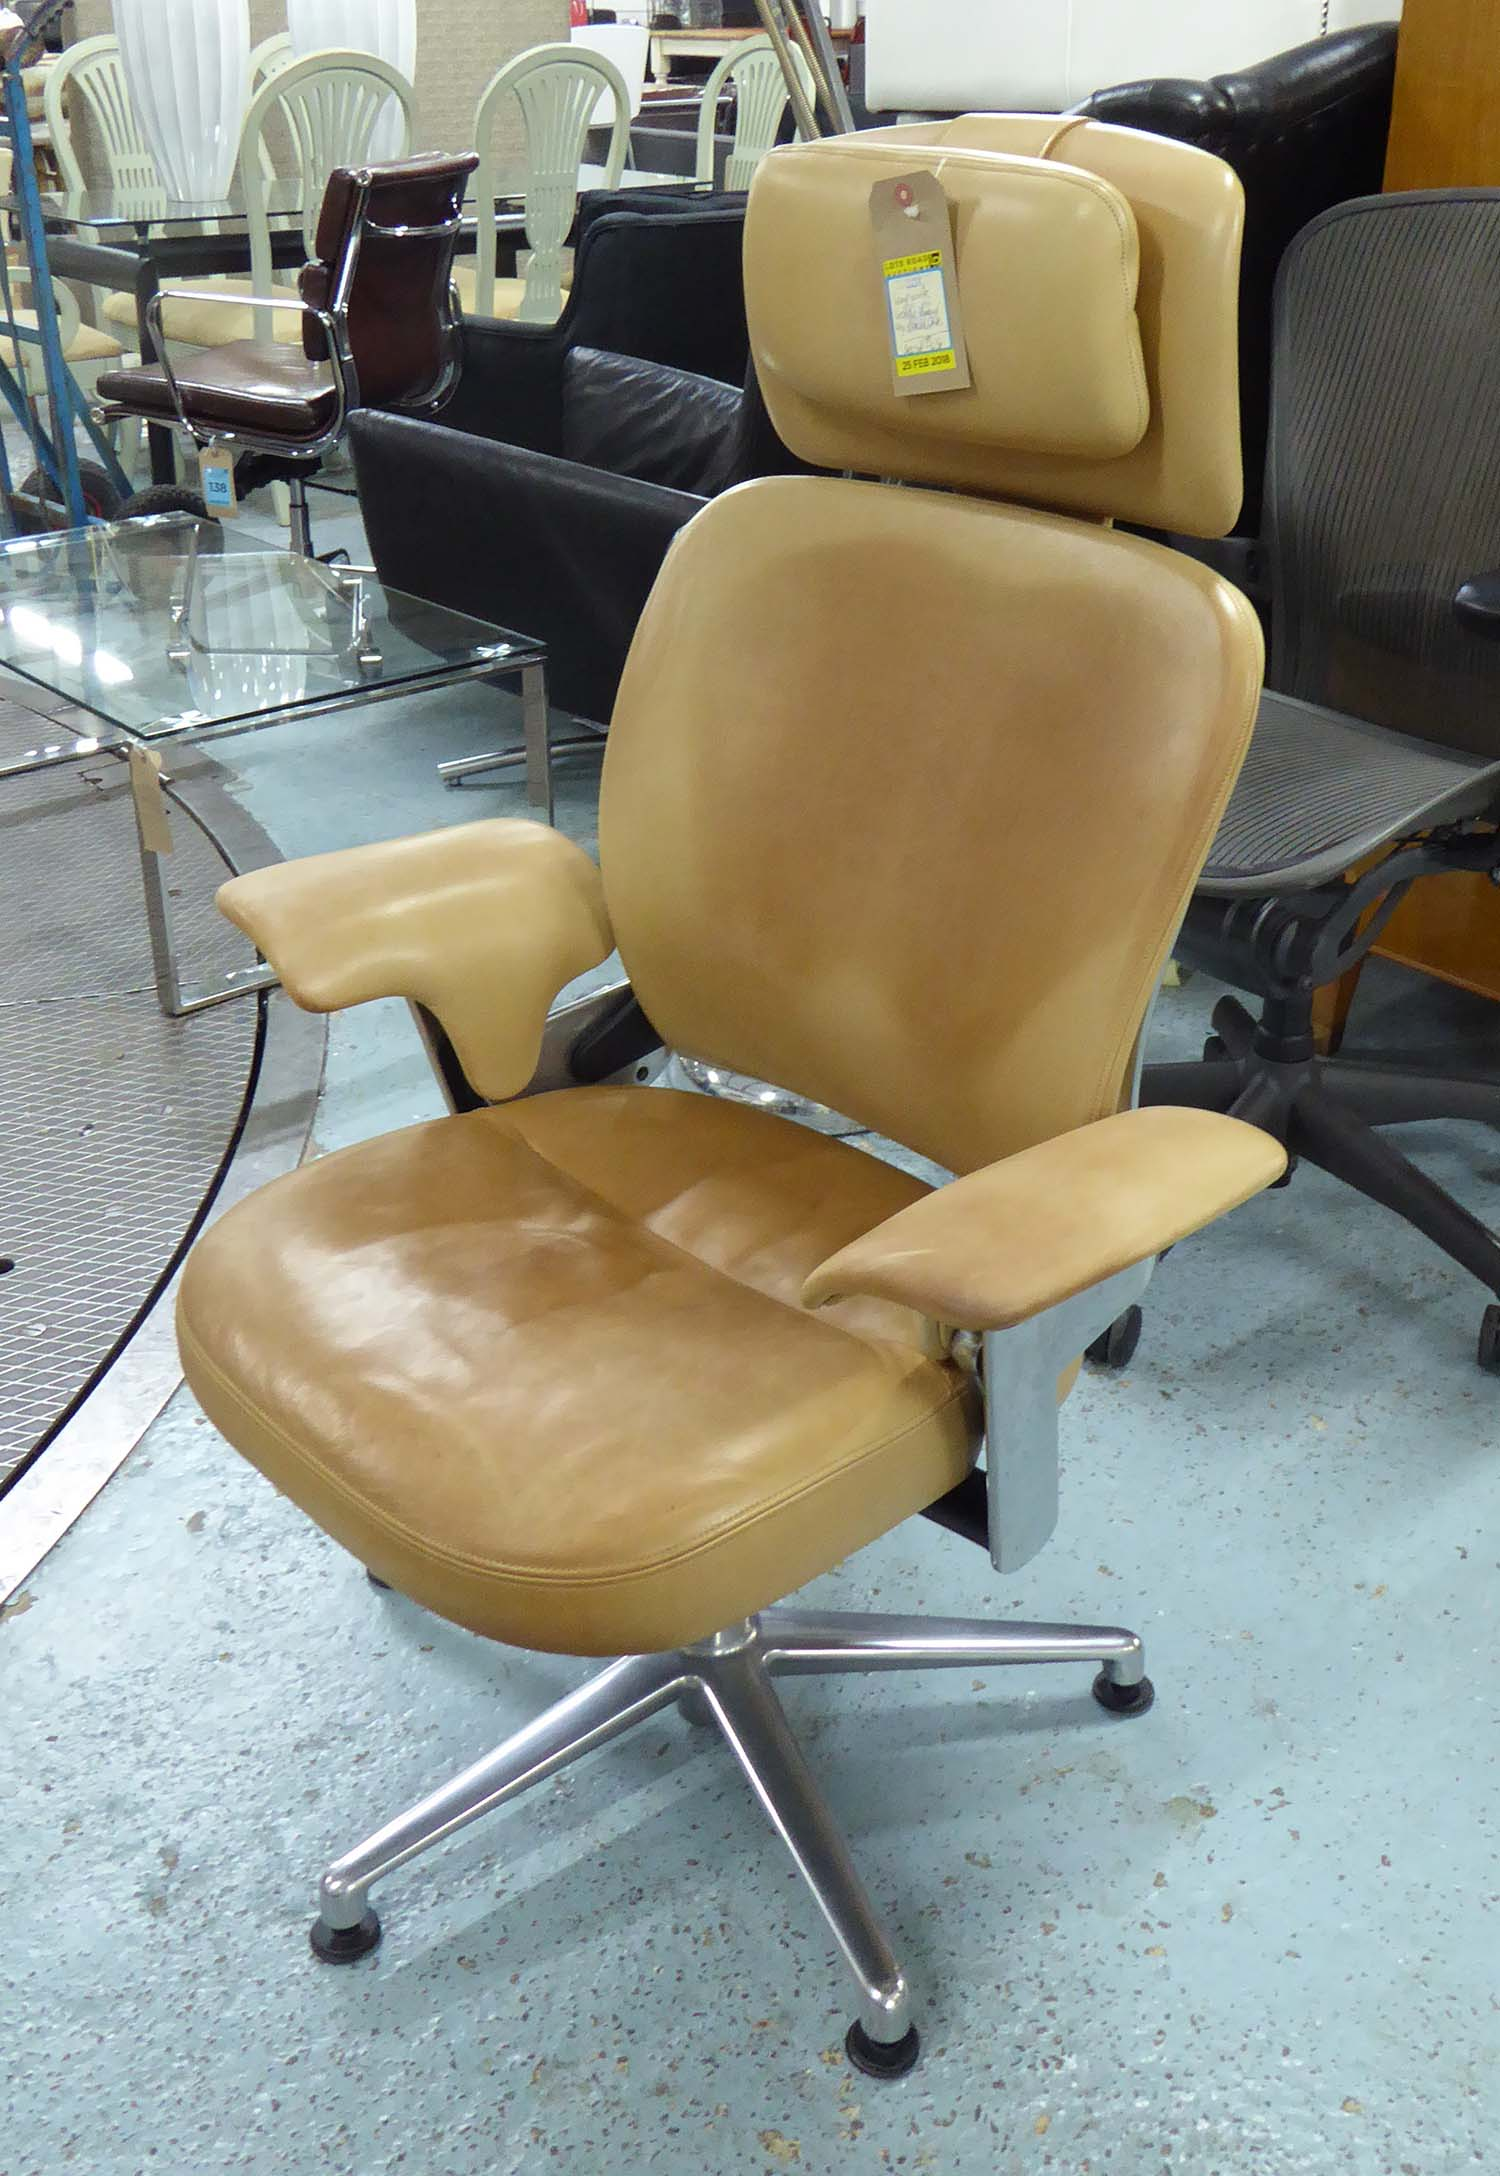 Enjoyable Leap Work Lounge Chair By Steelcase 115Cm H Creativecarmelina Interior Chair Design Creativecarmelinacom